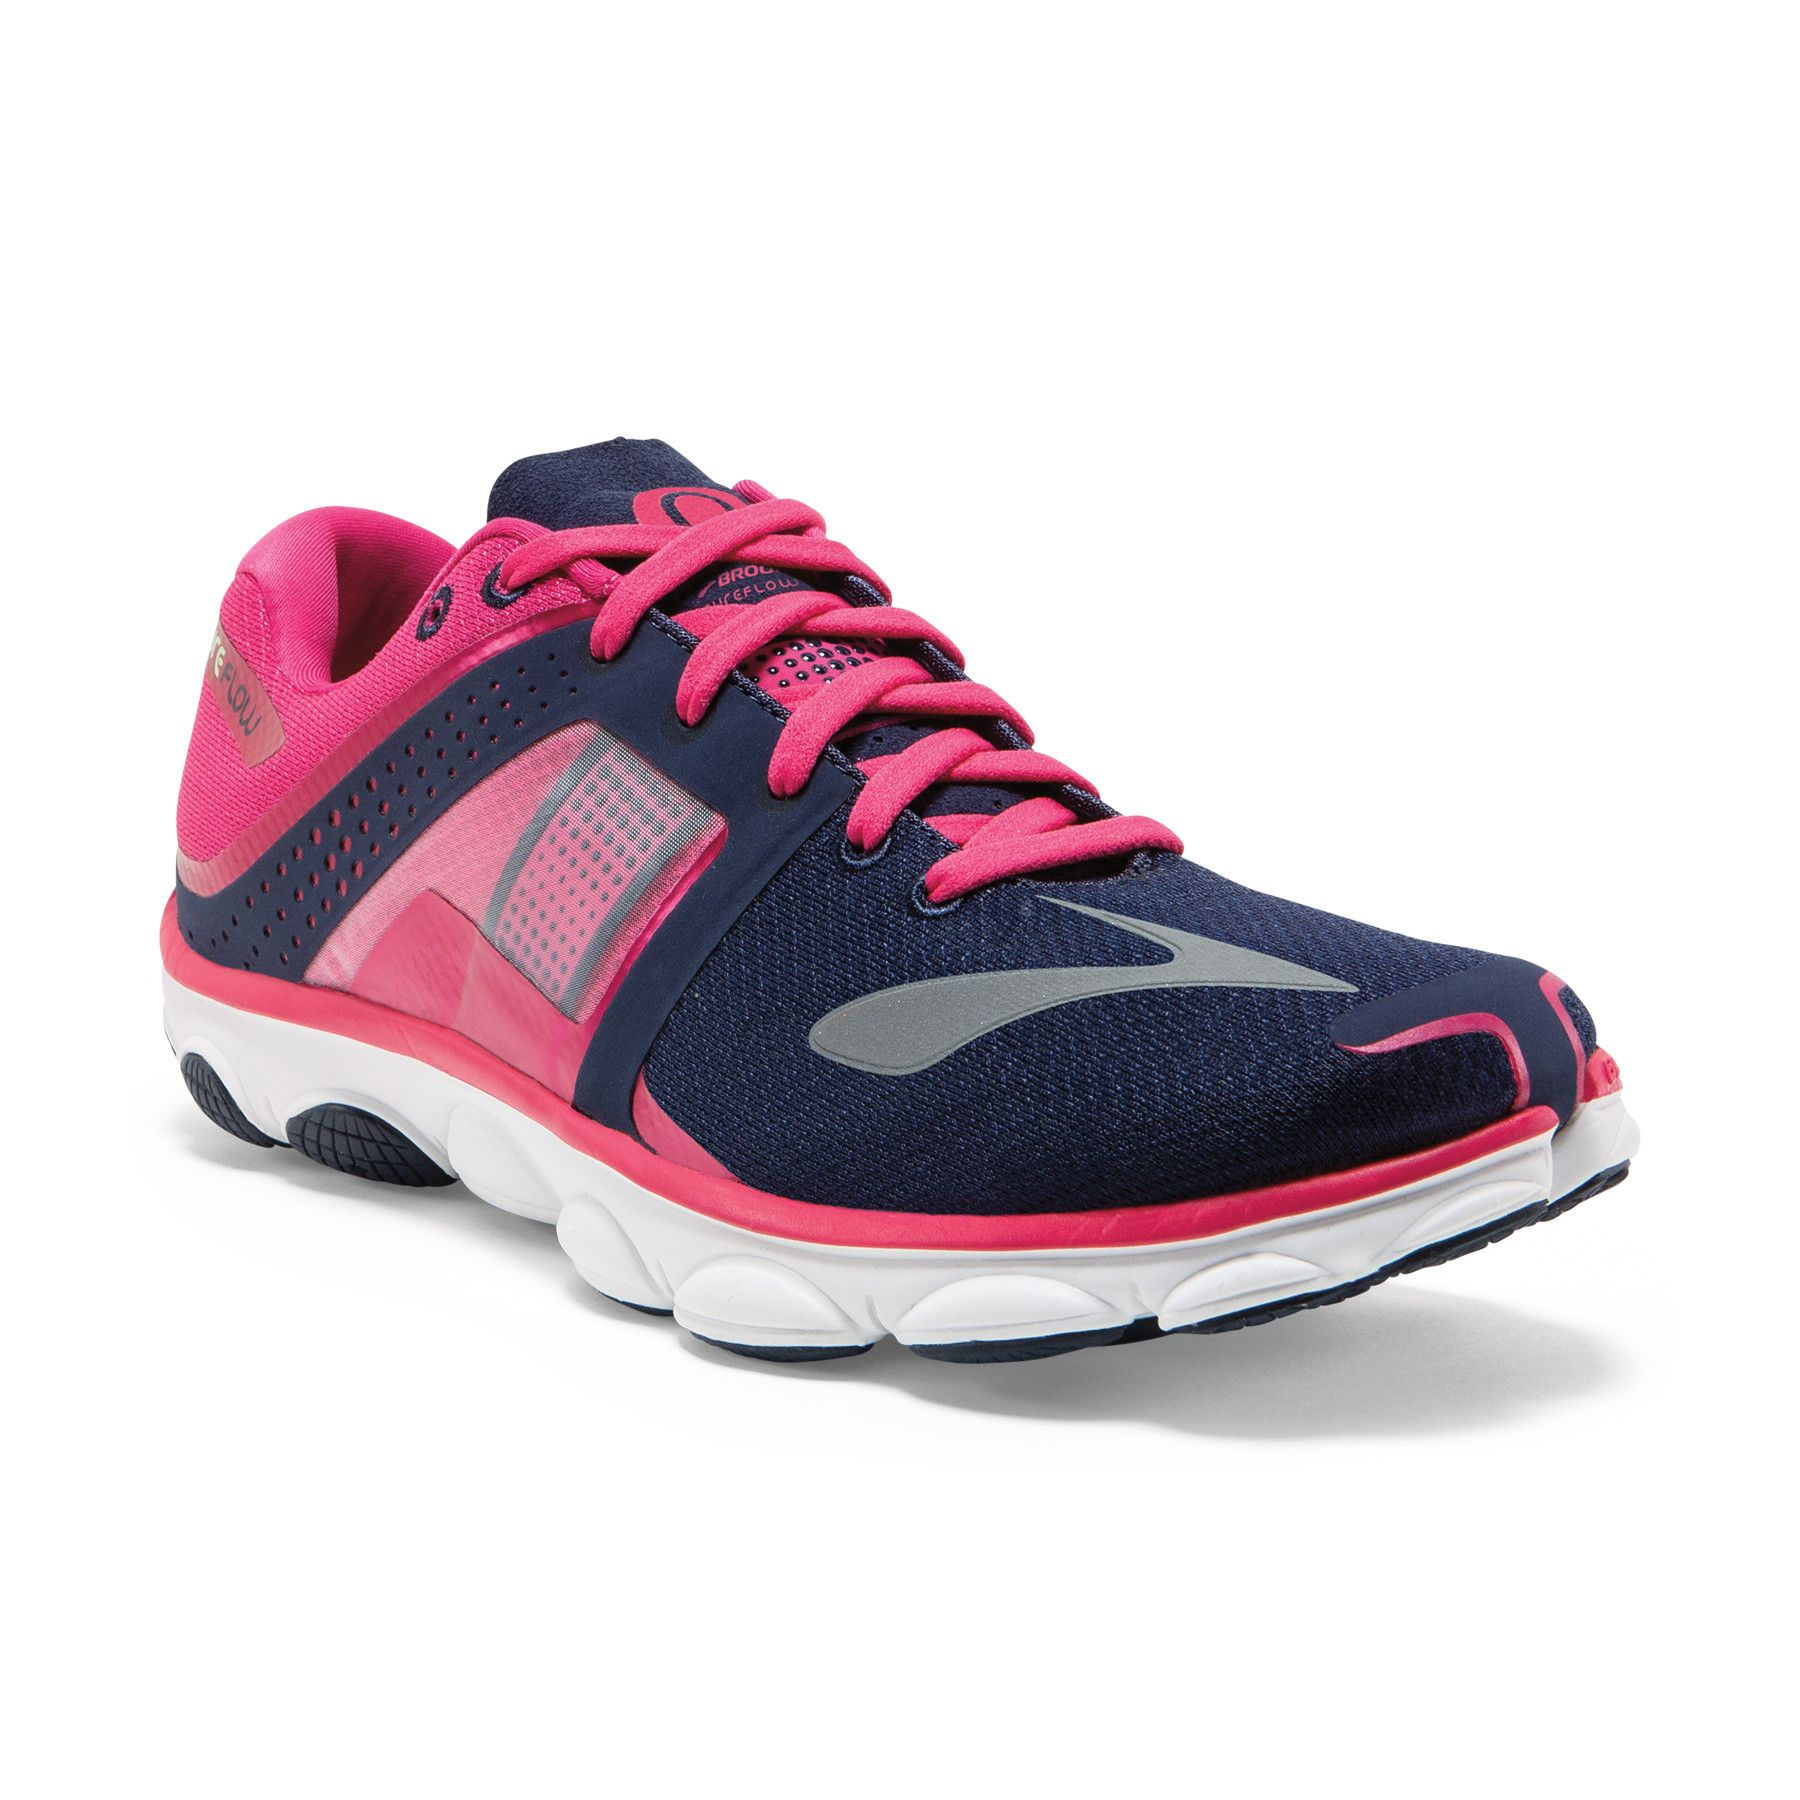 Feel Your Run with the Brooks Pureflow 4 Fleet feet